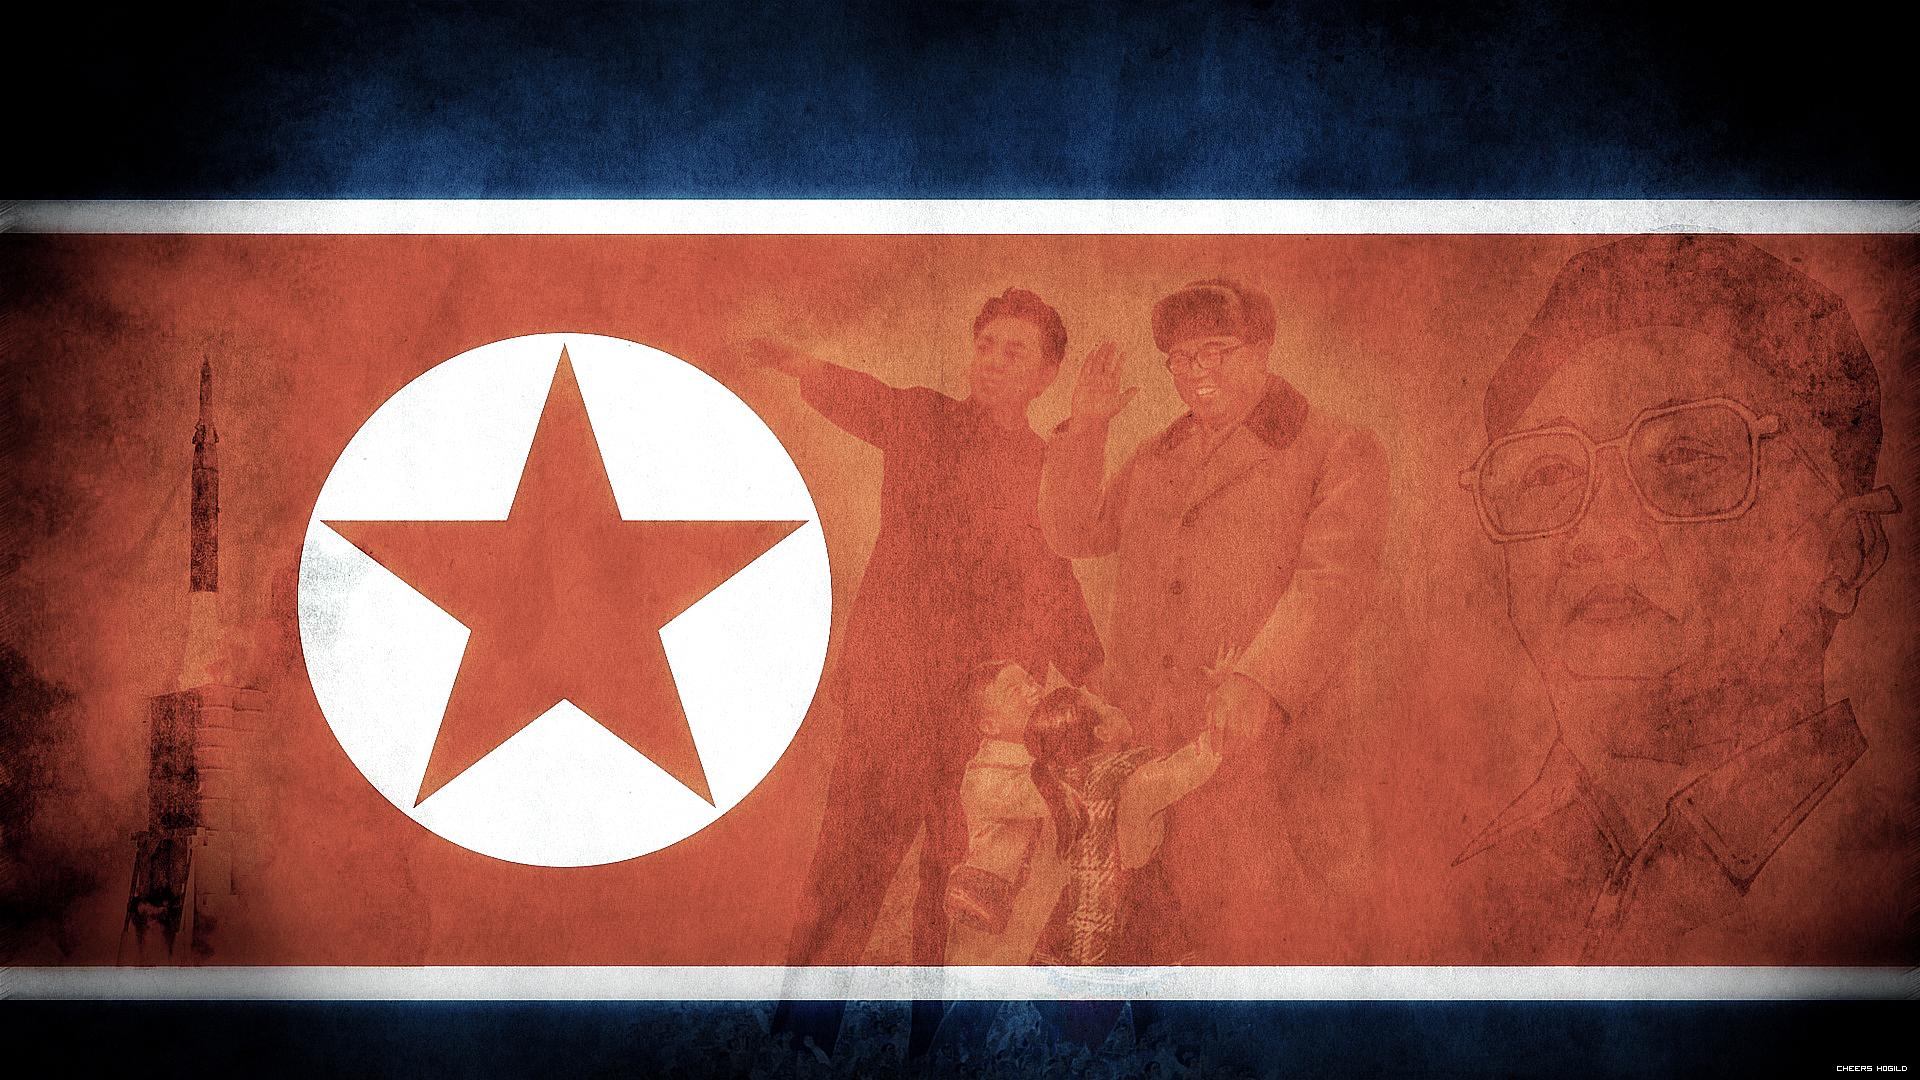 North Korea Wallpaper By D3m0 On Deviantart